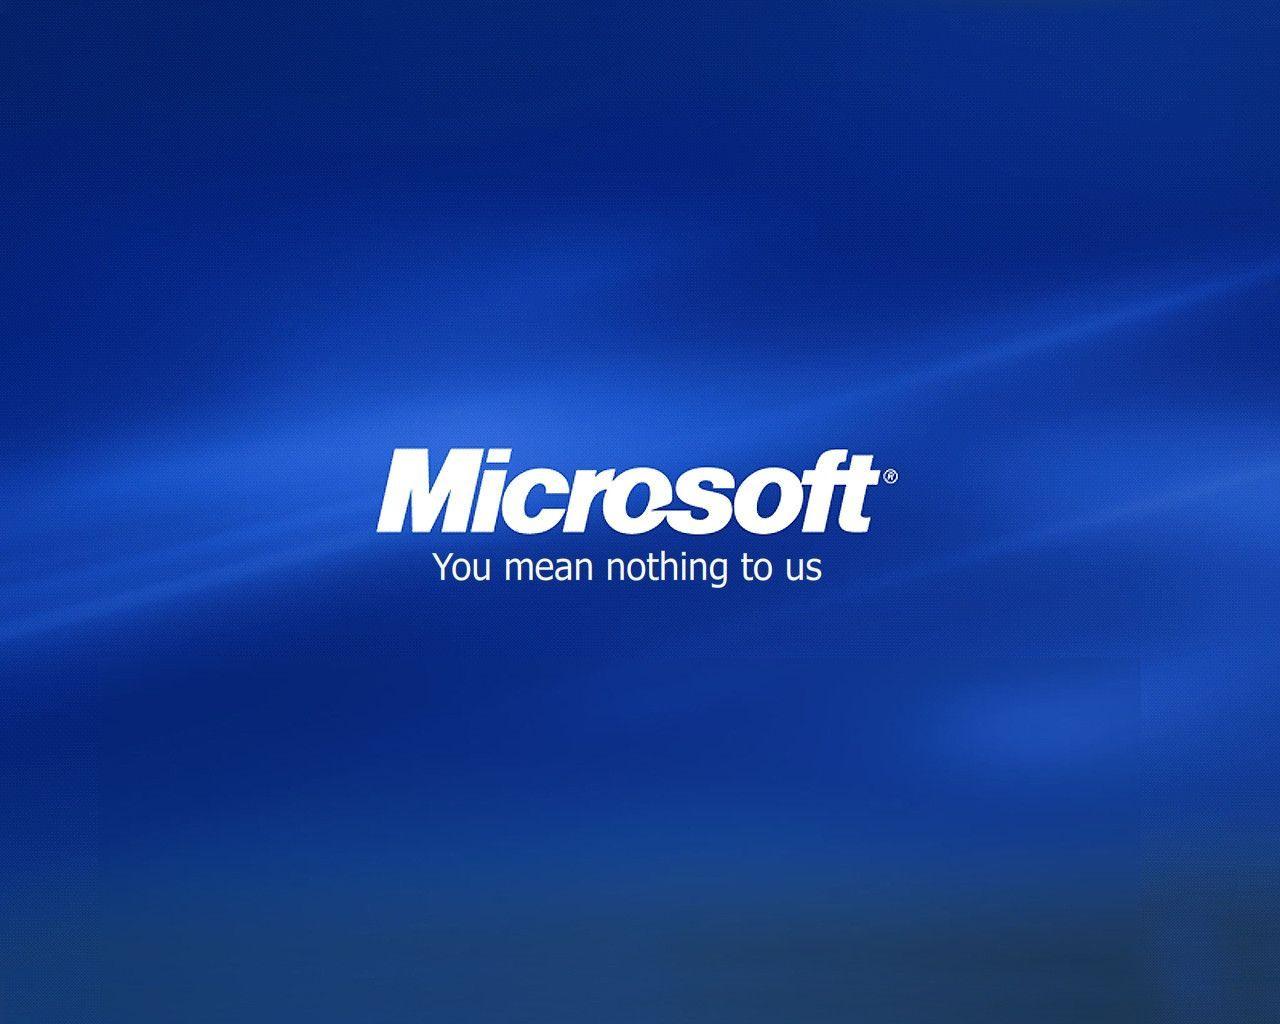 Microsoft Wallpaper HD HD Wallpapers Pinterest Microsoft